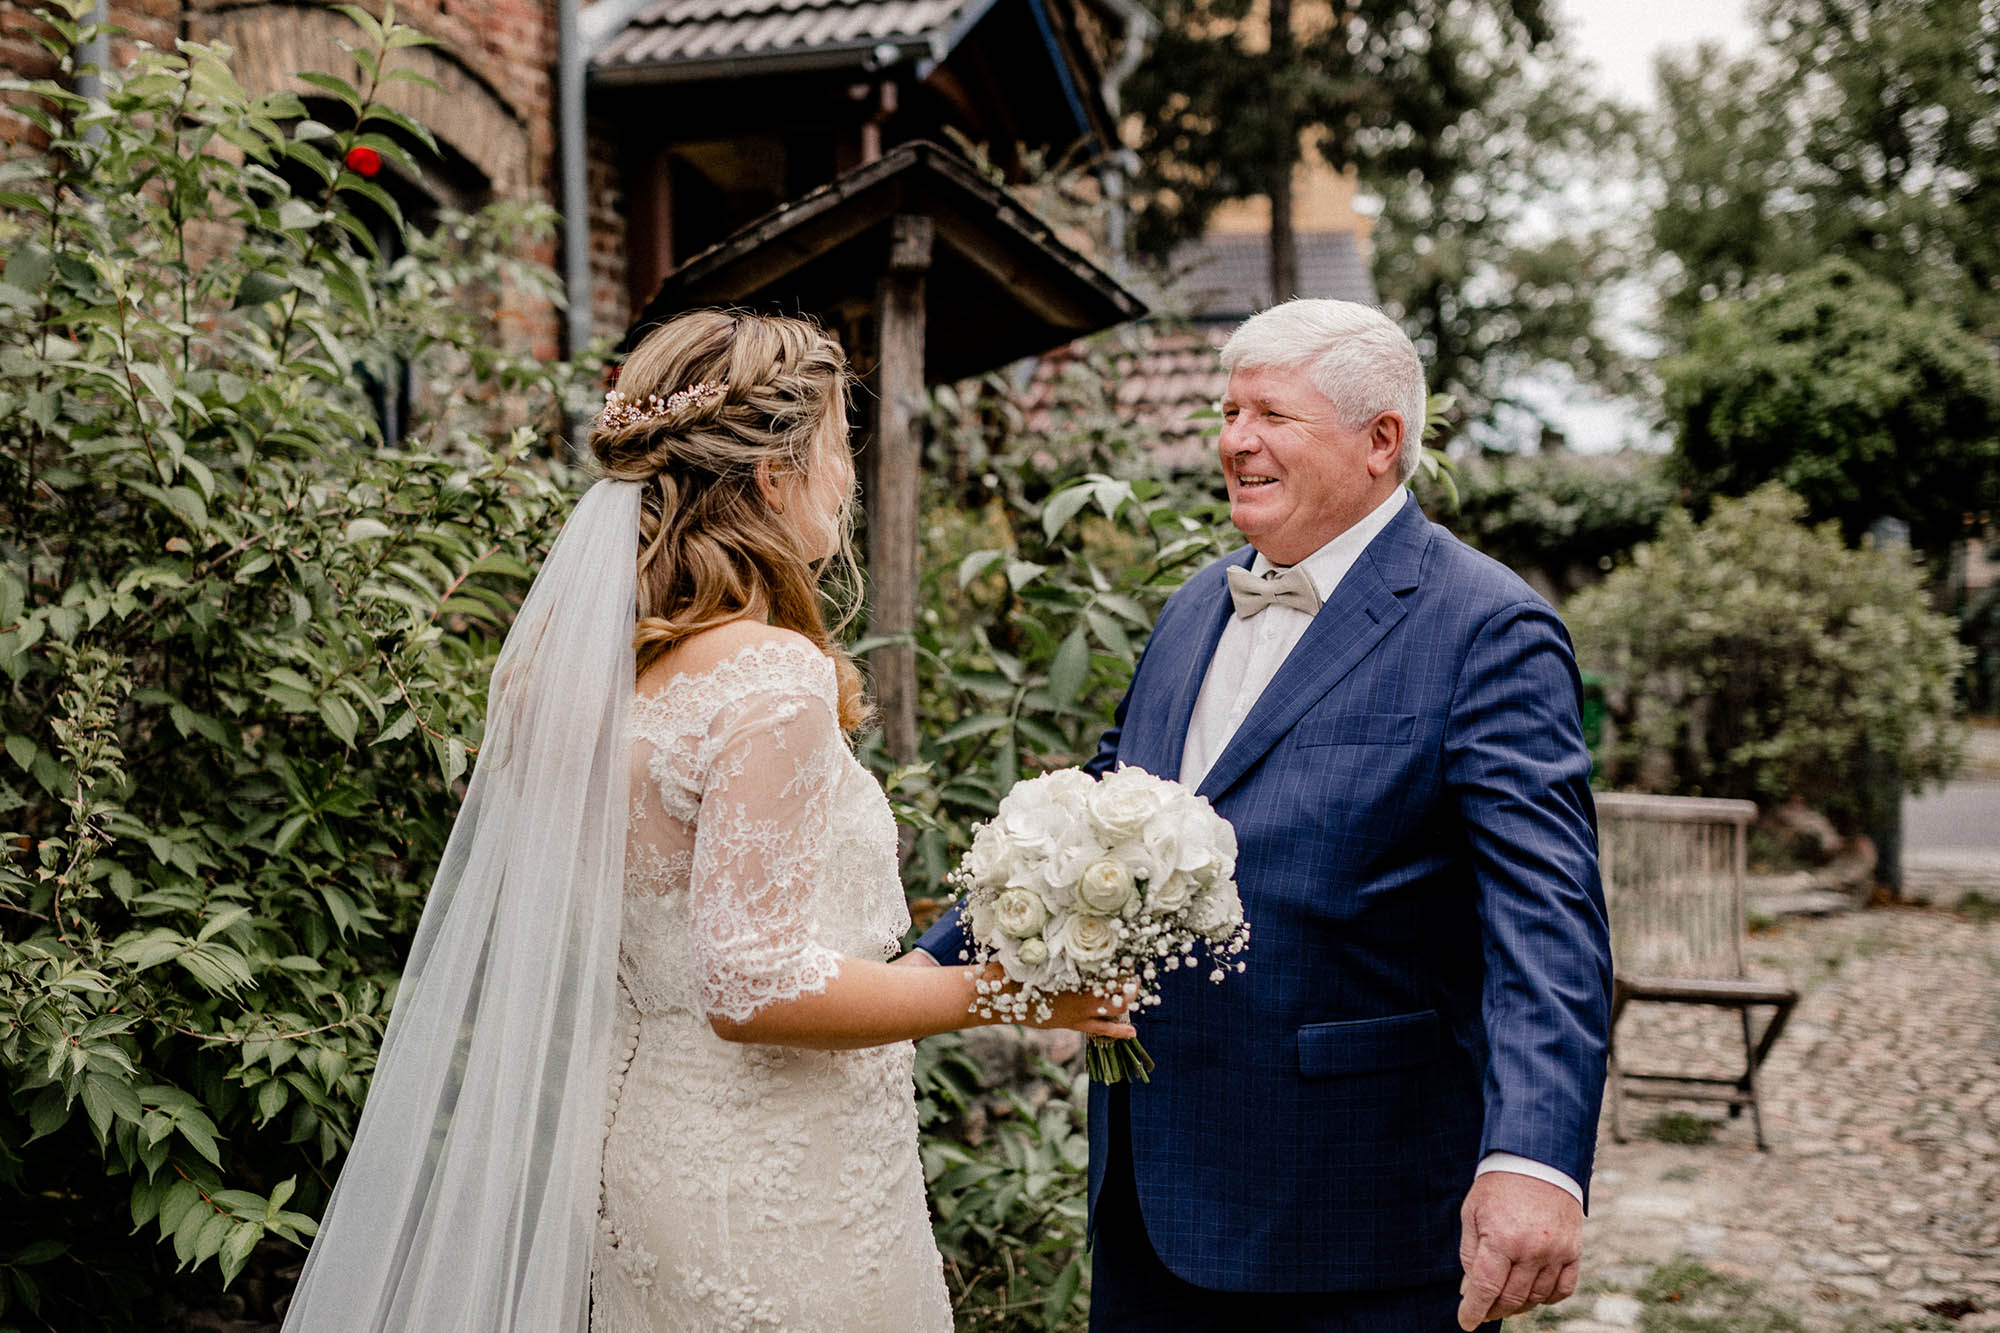 Virginia-Pech-Fotografie-Hochzeitsfotograf-Hochzeitsfotografie-Kulturscheune-Rangsdorf-Berlin-Anika-Nico-24